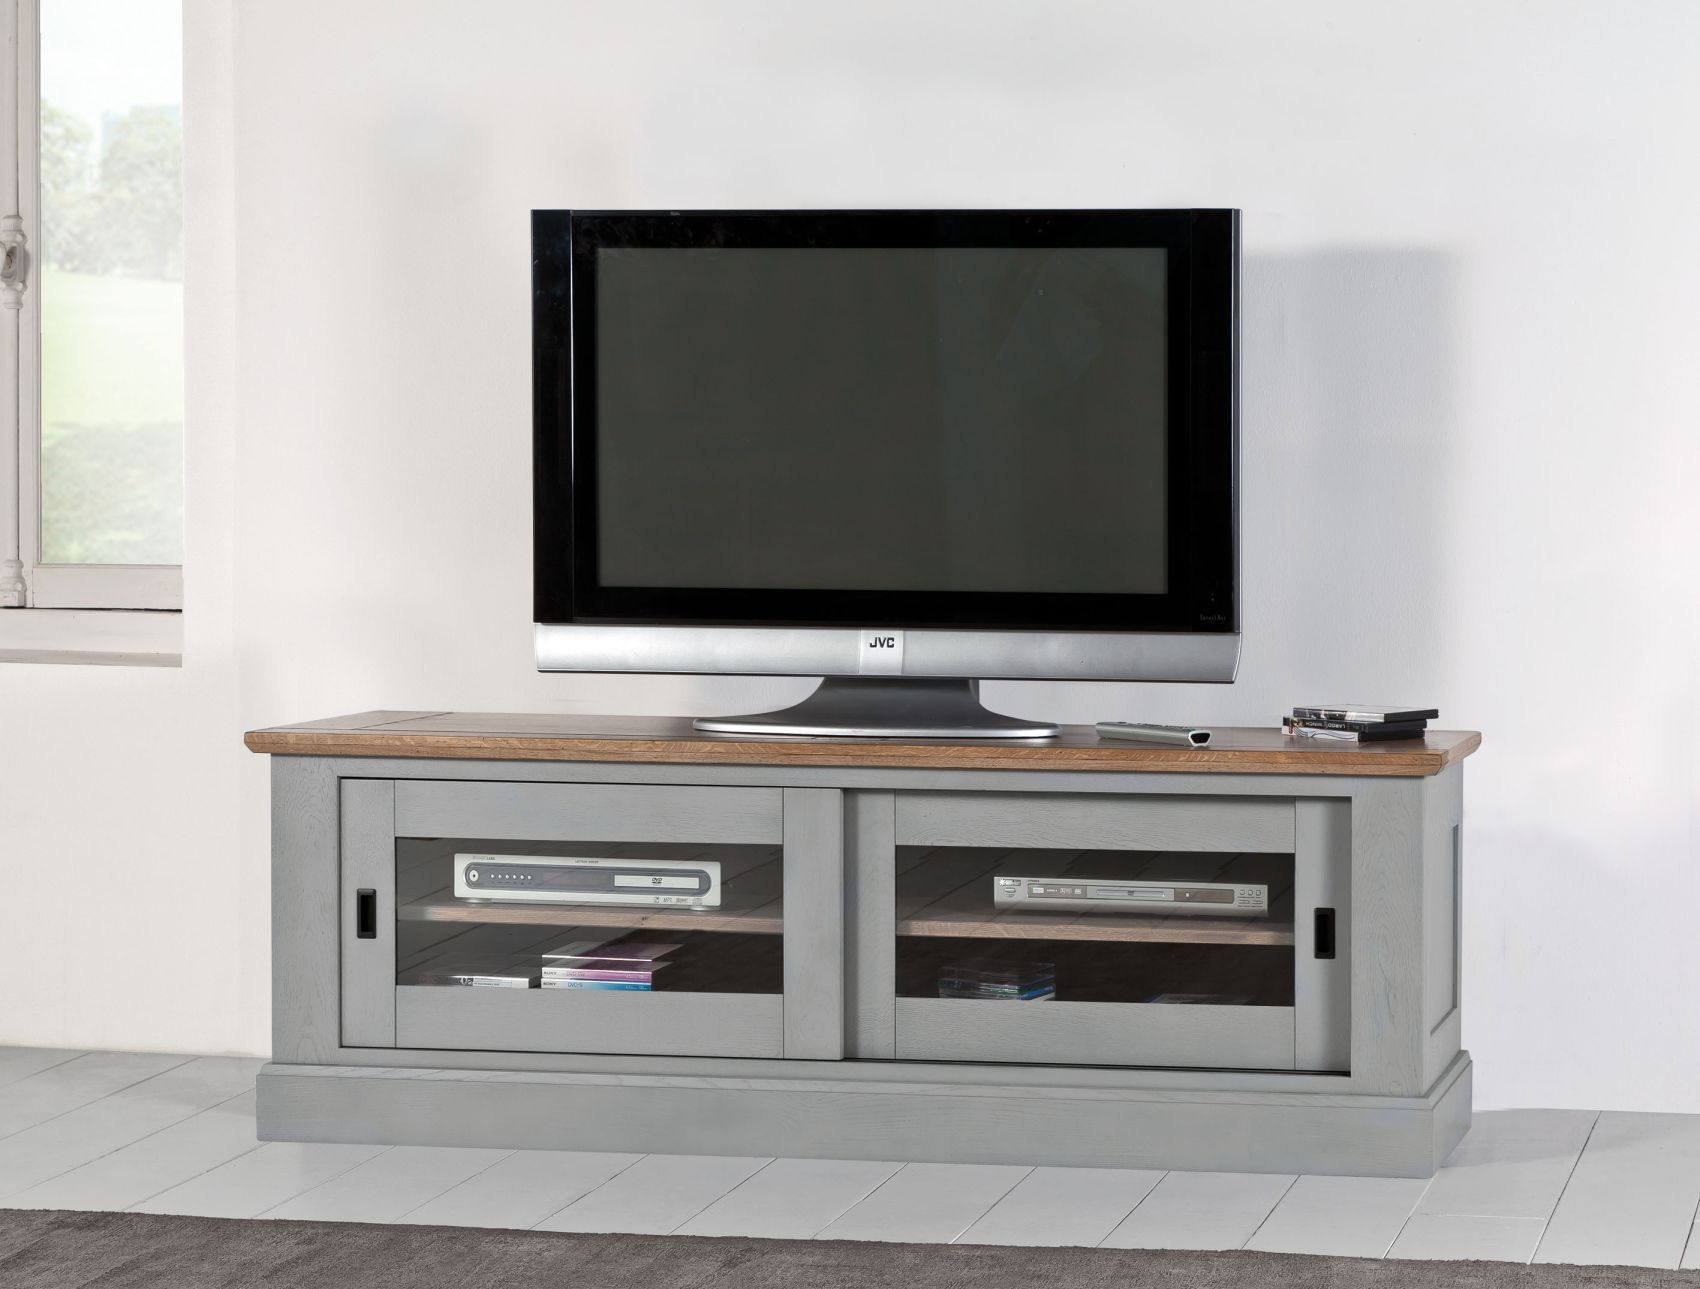 meuble tv romance meubles gibaud. Black Bedroom Furniture Sets. Home Design Ideas